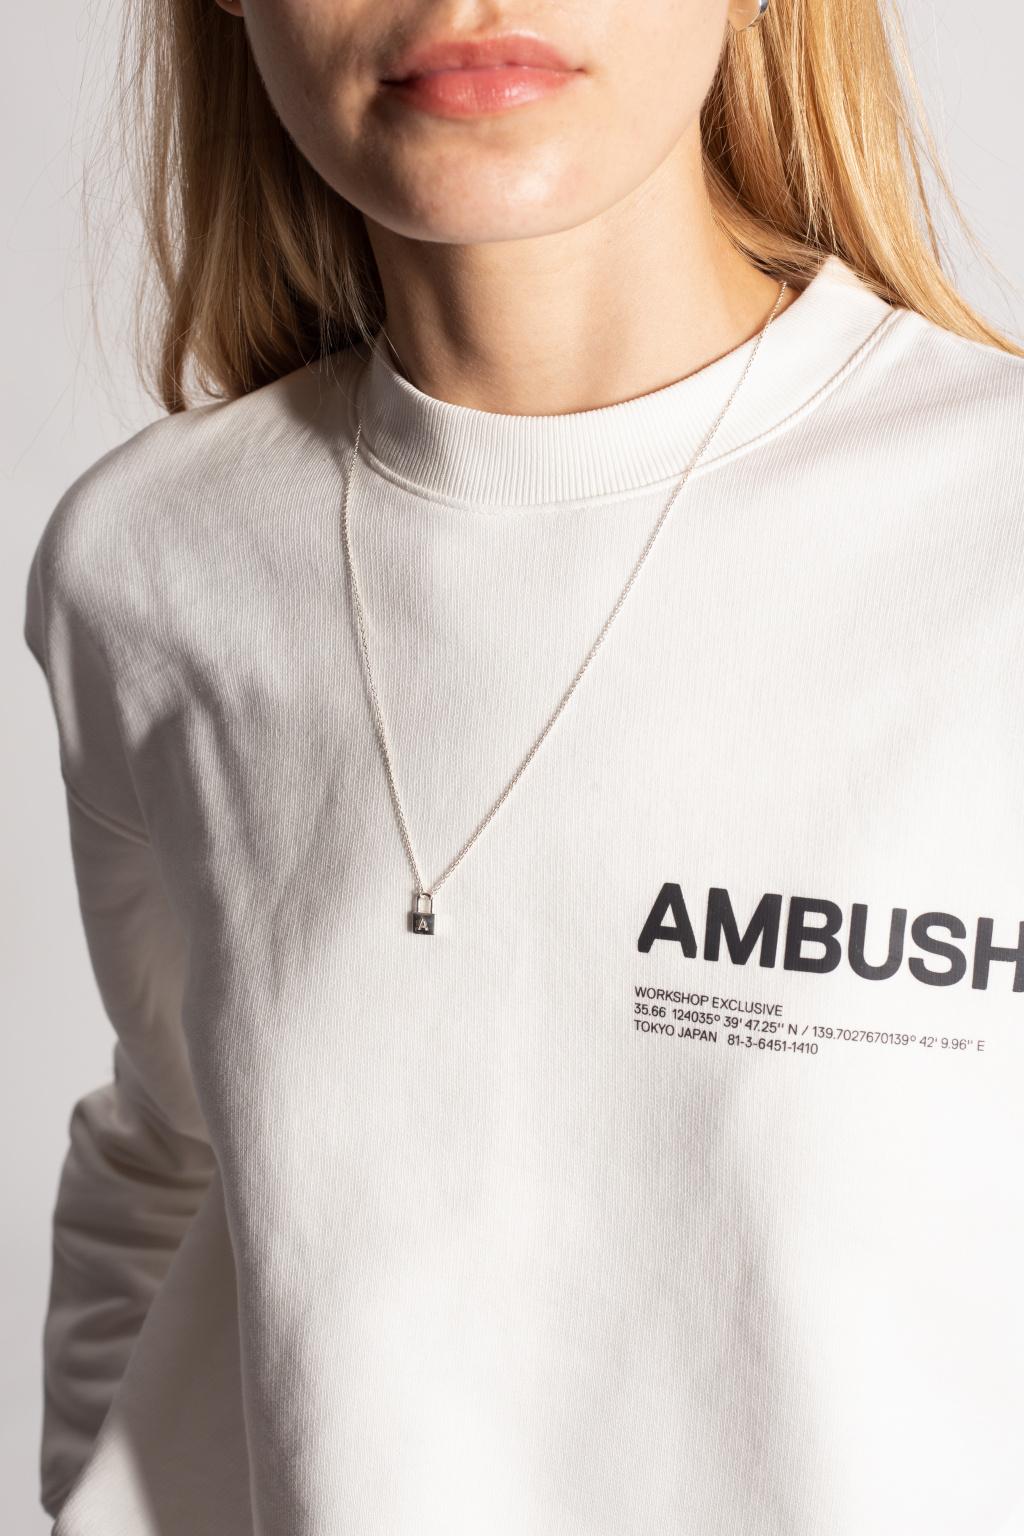 Ambush Silver necklace with charm